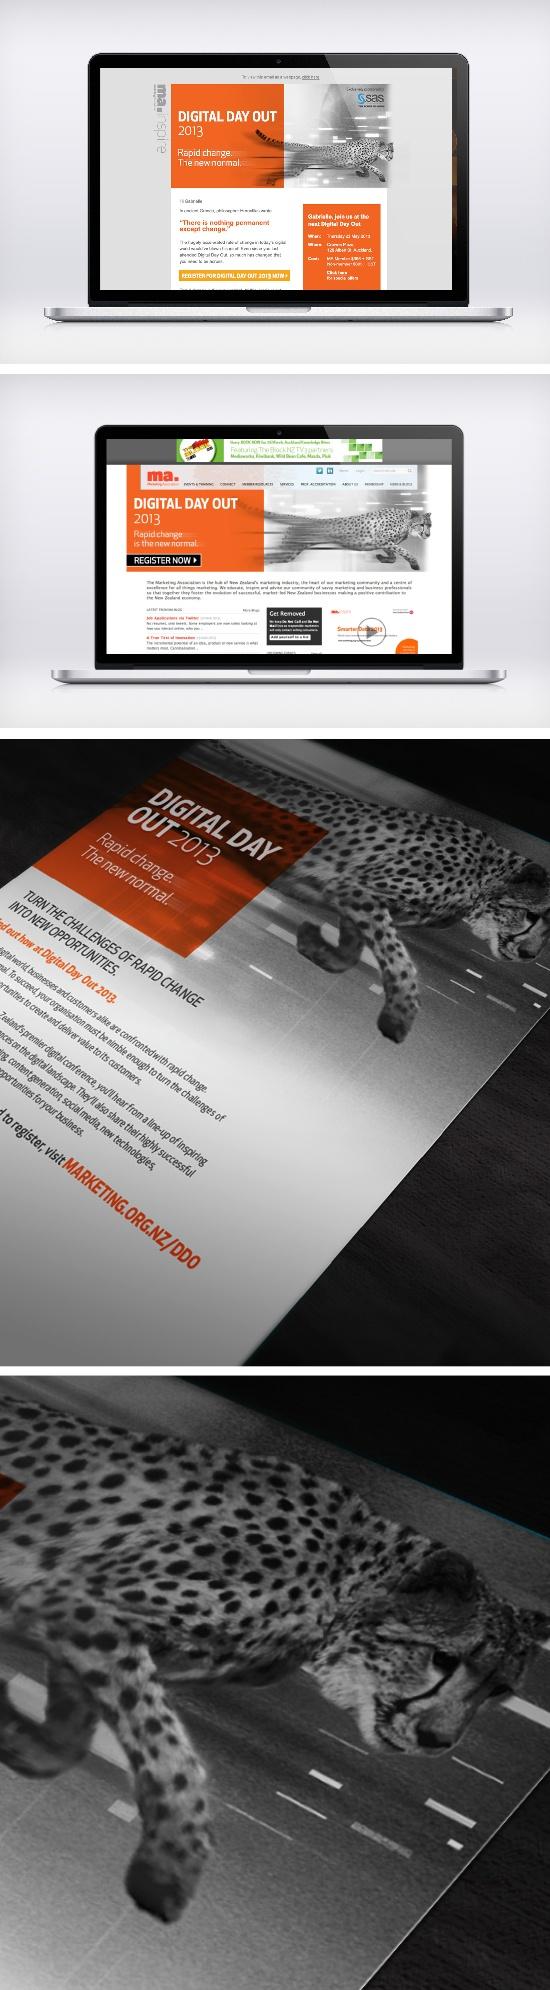 Marketing Association. Digital Day Out 2013.